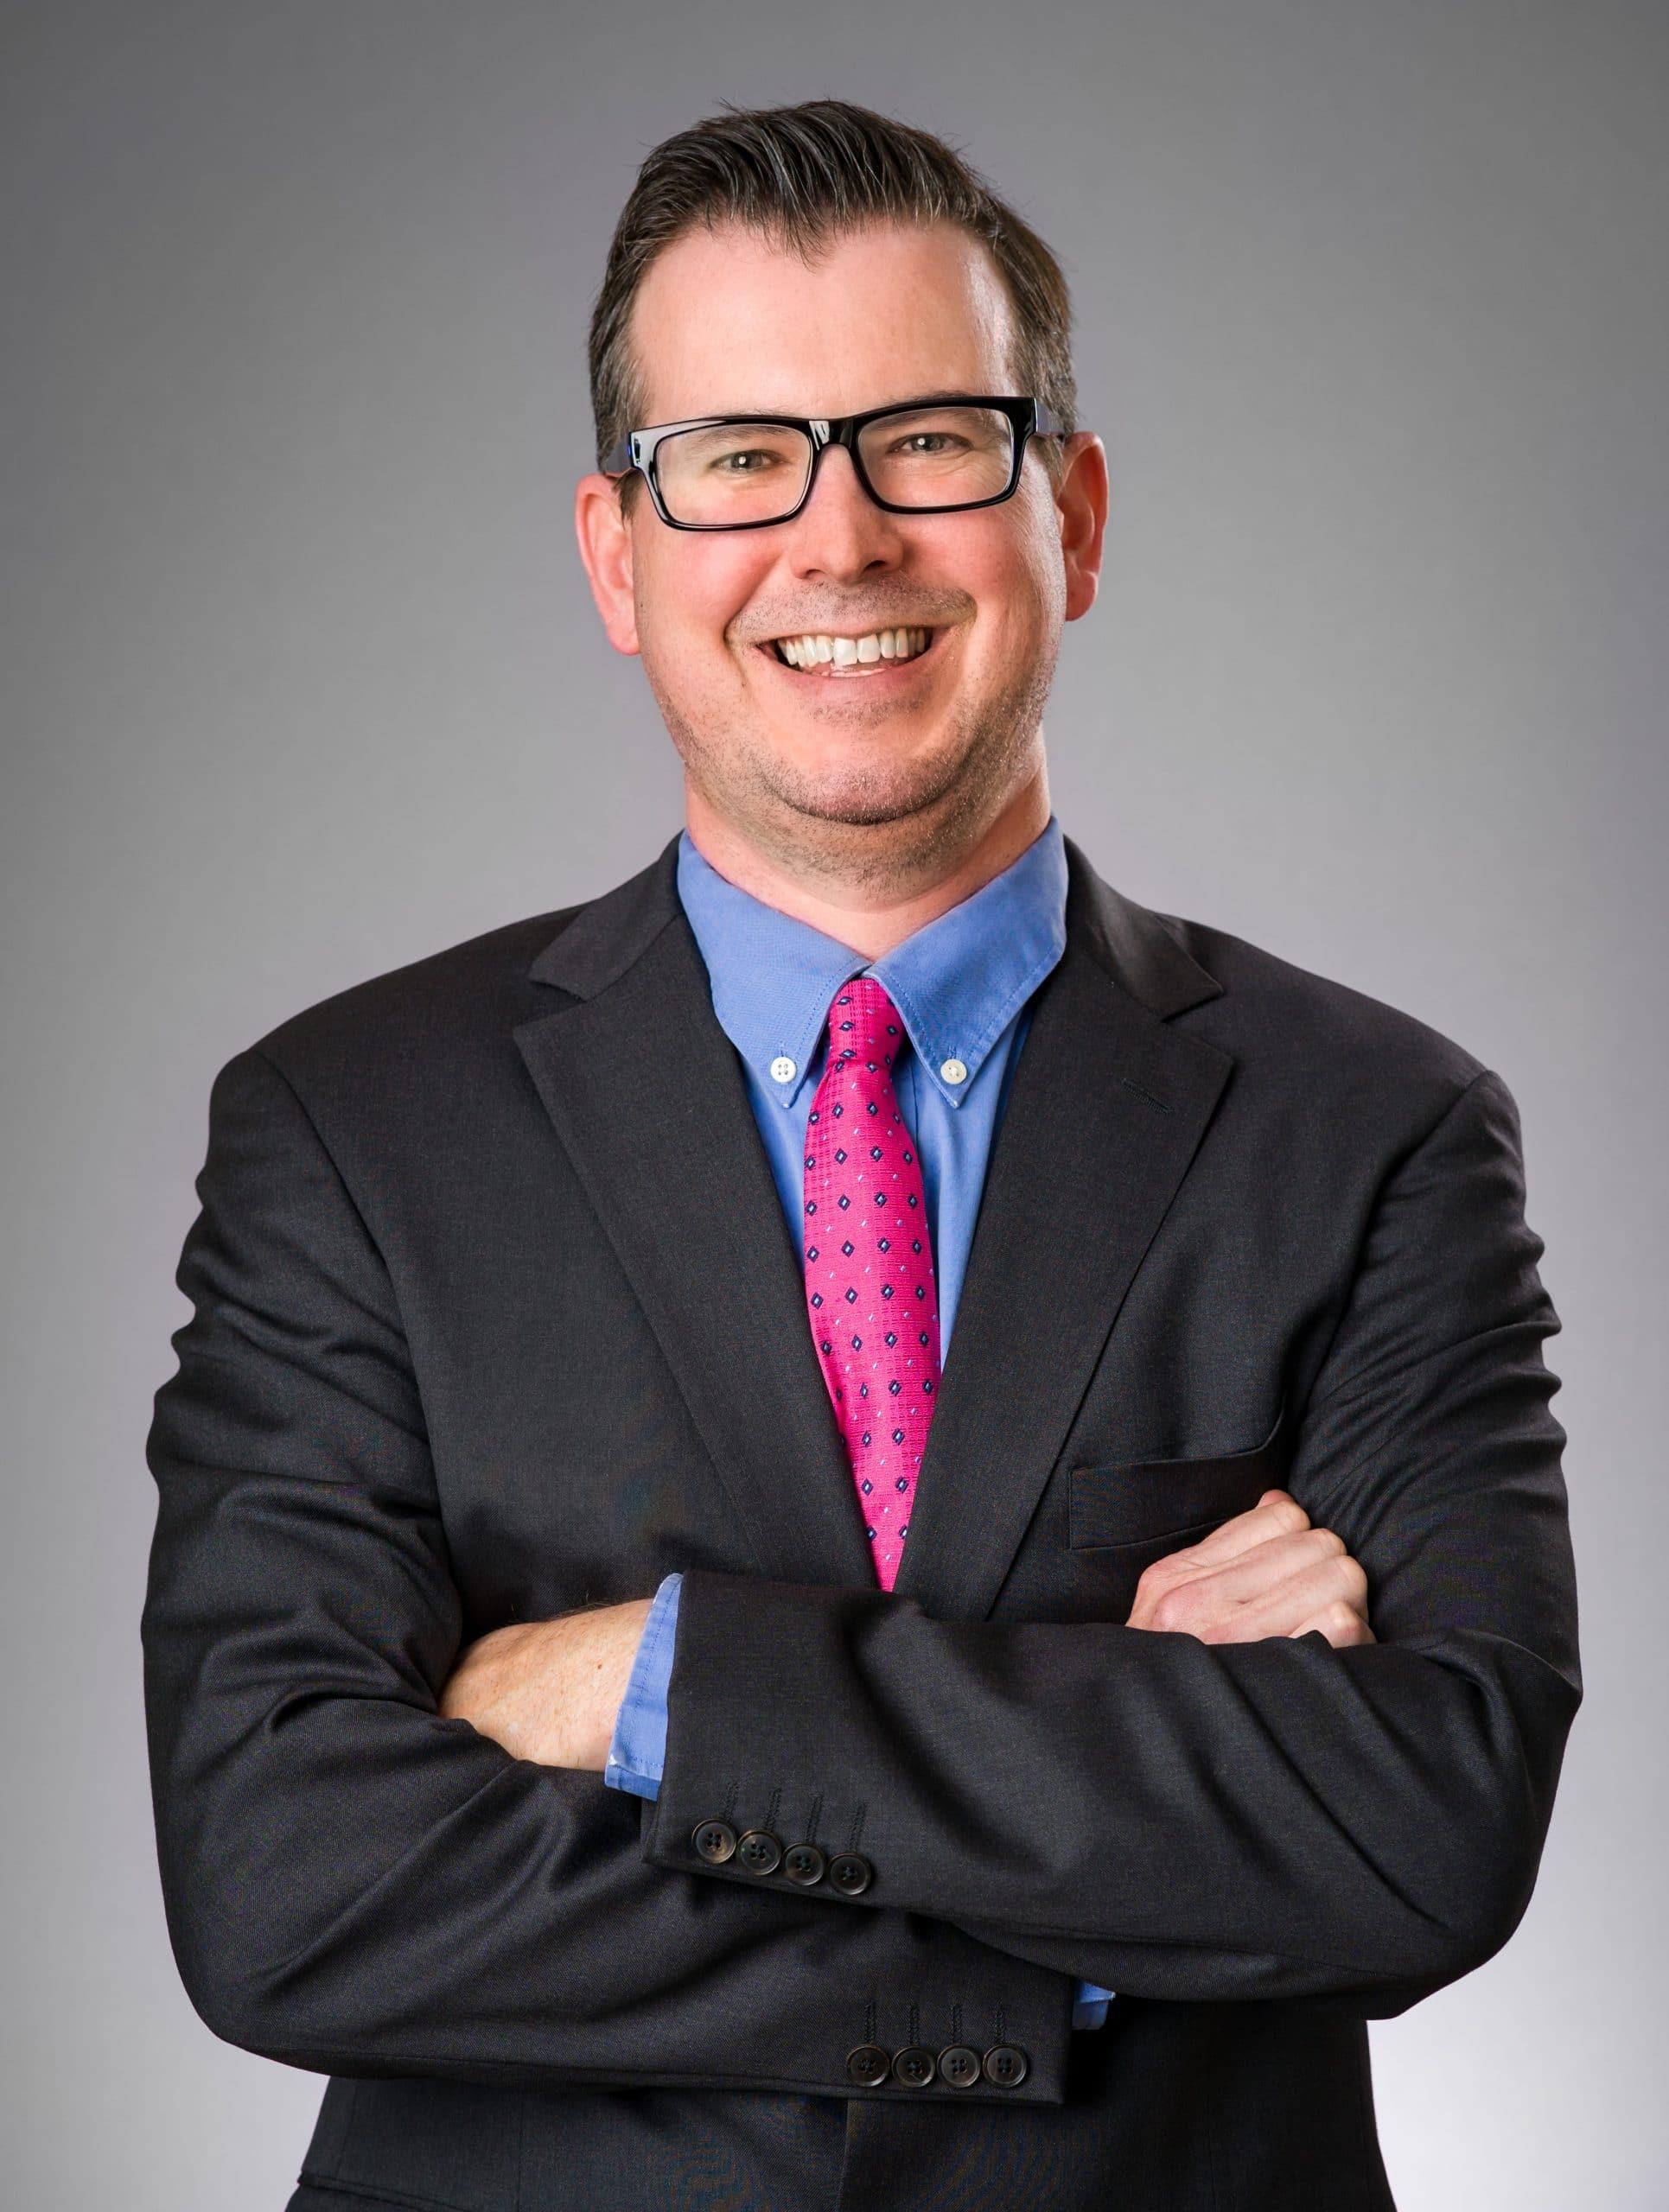 Michael C. Maschke, CEO, Director of Cybersecurity and Digital Forensics at Sensei Enterprises, Inc.